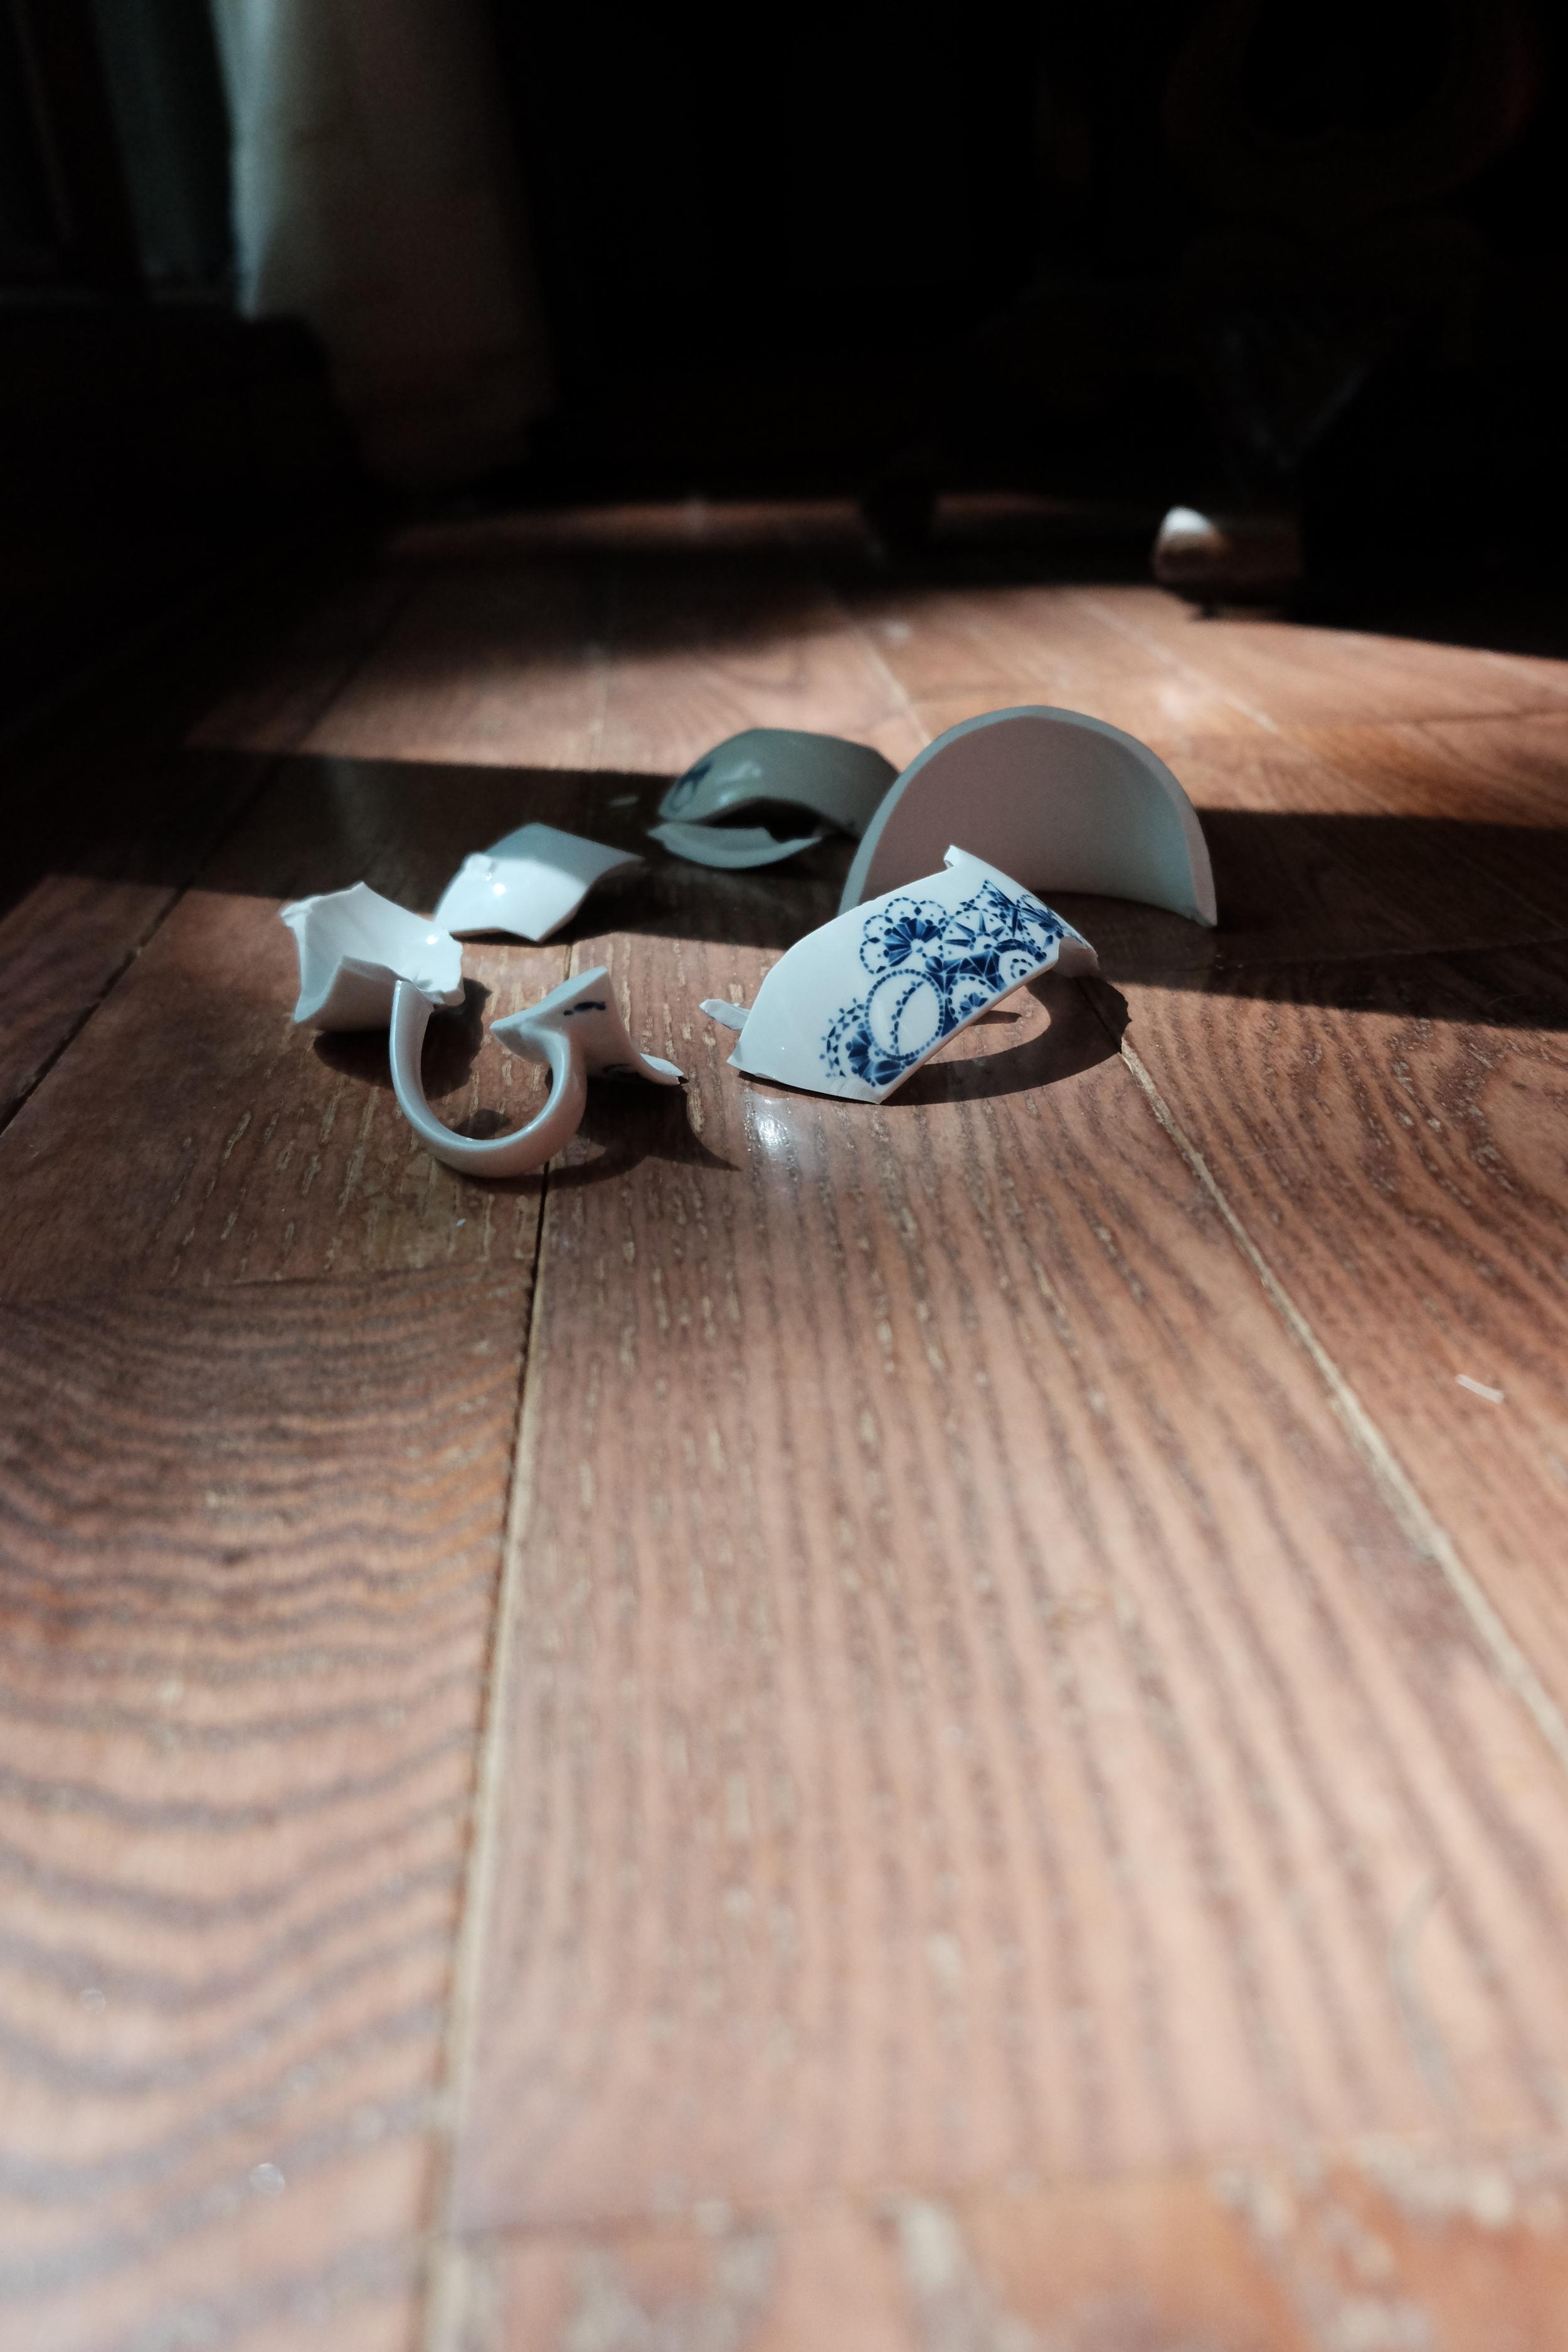 Limetown Teacup • 18mm • f/2.8 • 1/2000 • ISO 3200